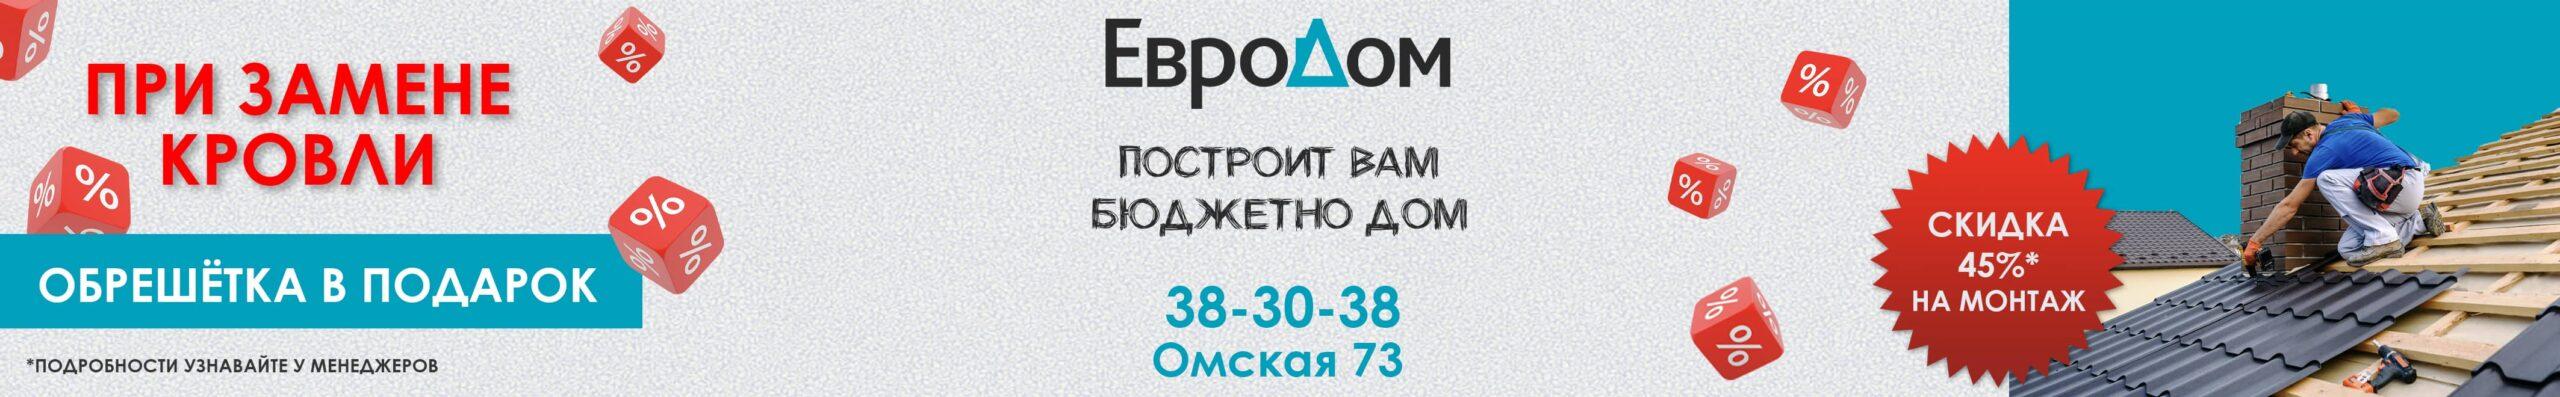 БАНЕР01-min